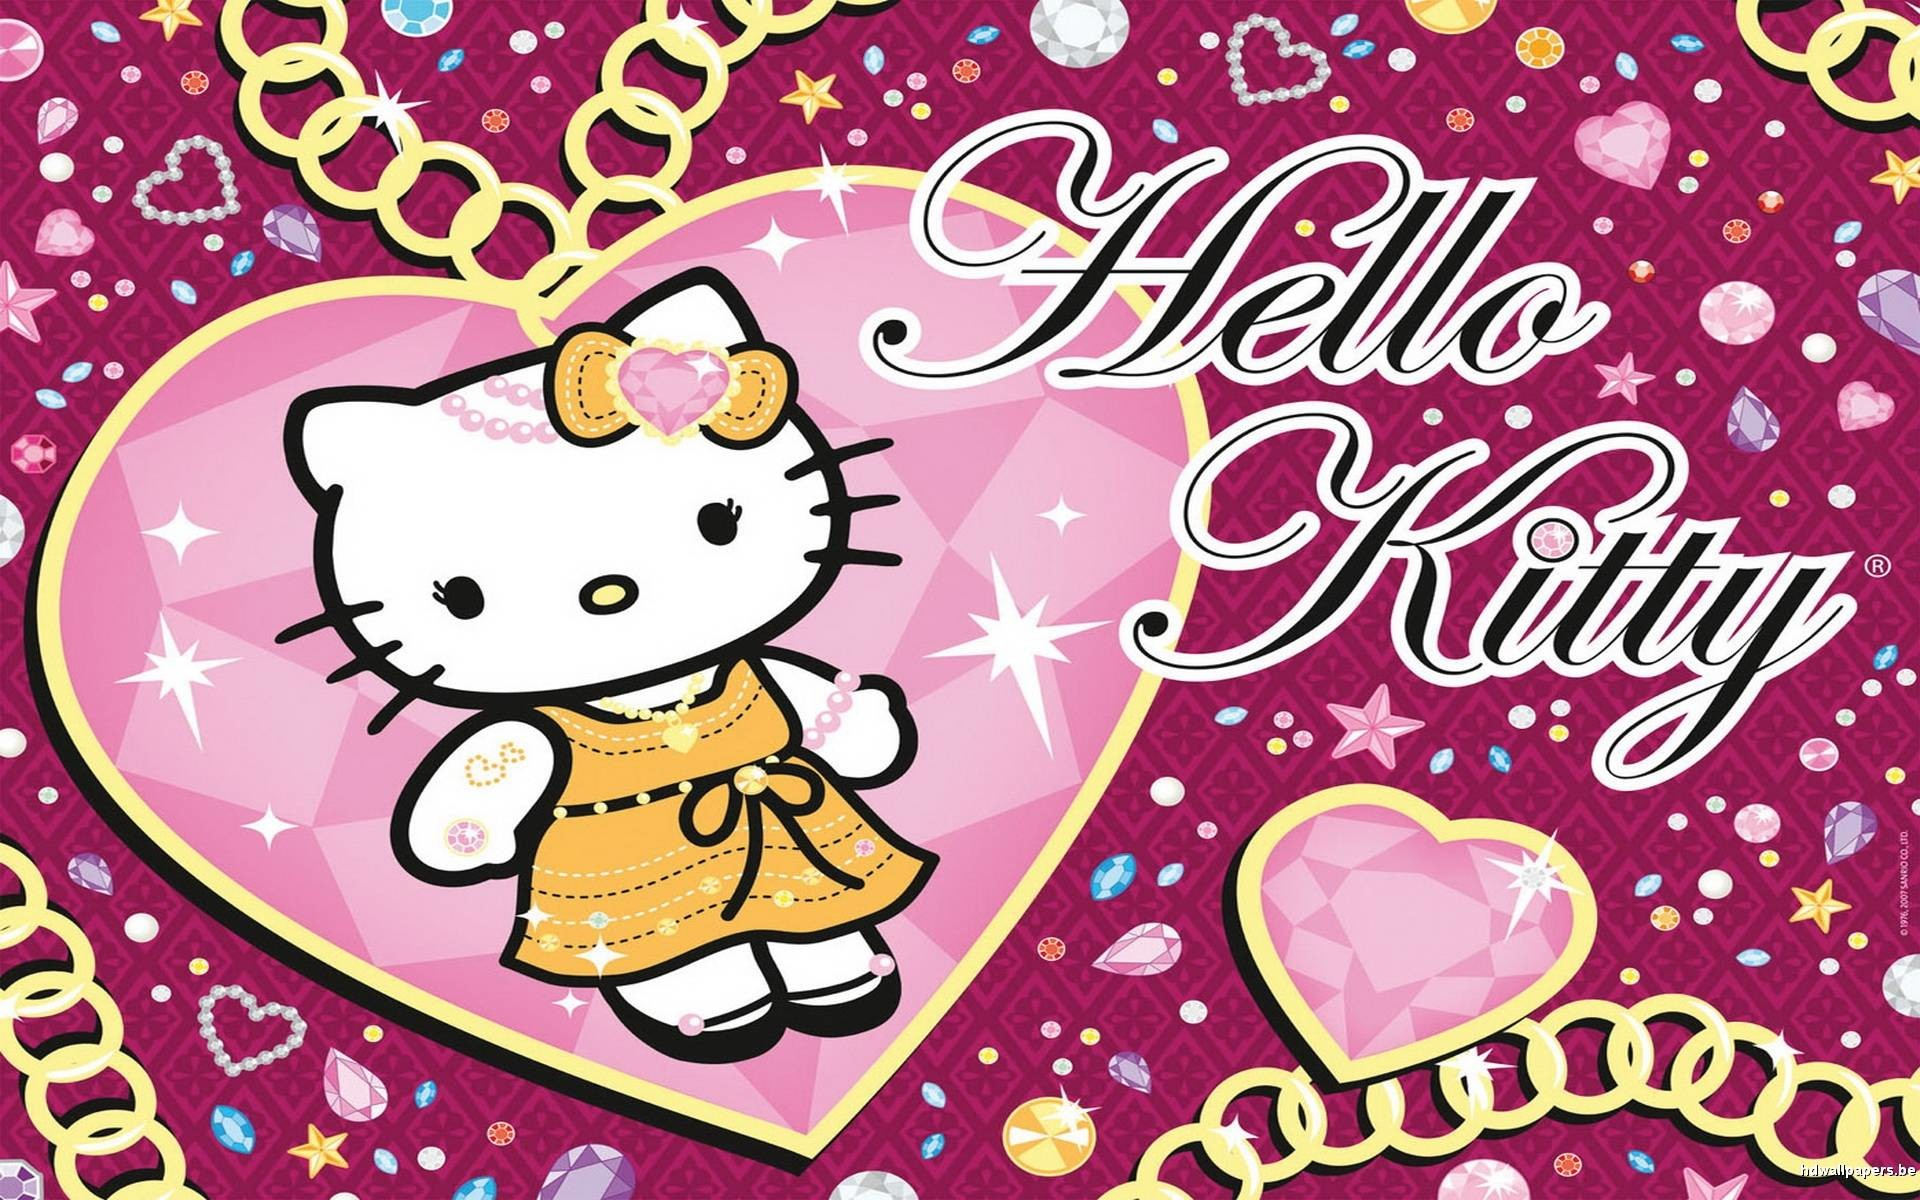 free download hello kitty wallpaper 2015Camelias Flores De Inverno